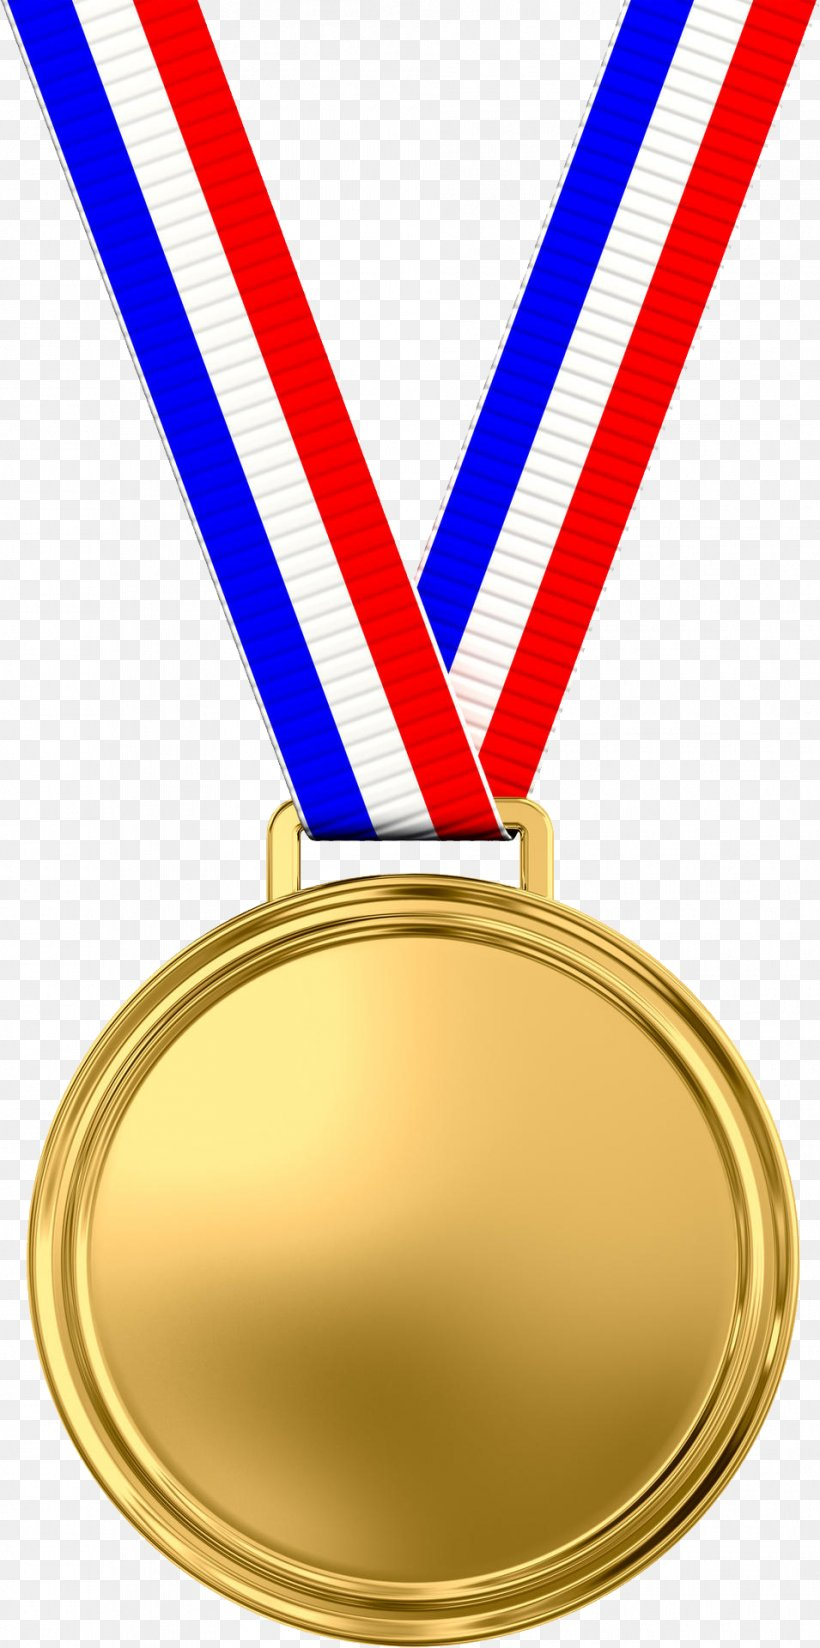 Gold Medal Clip Art, PNG, 955x1920px, Gold Medal, Award.